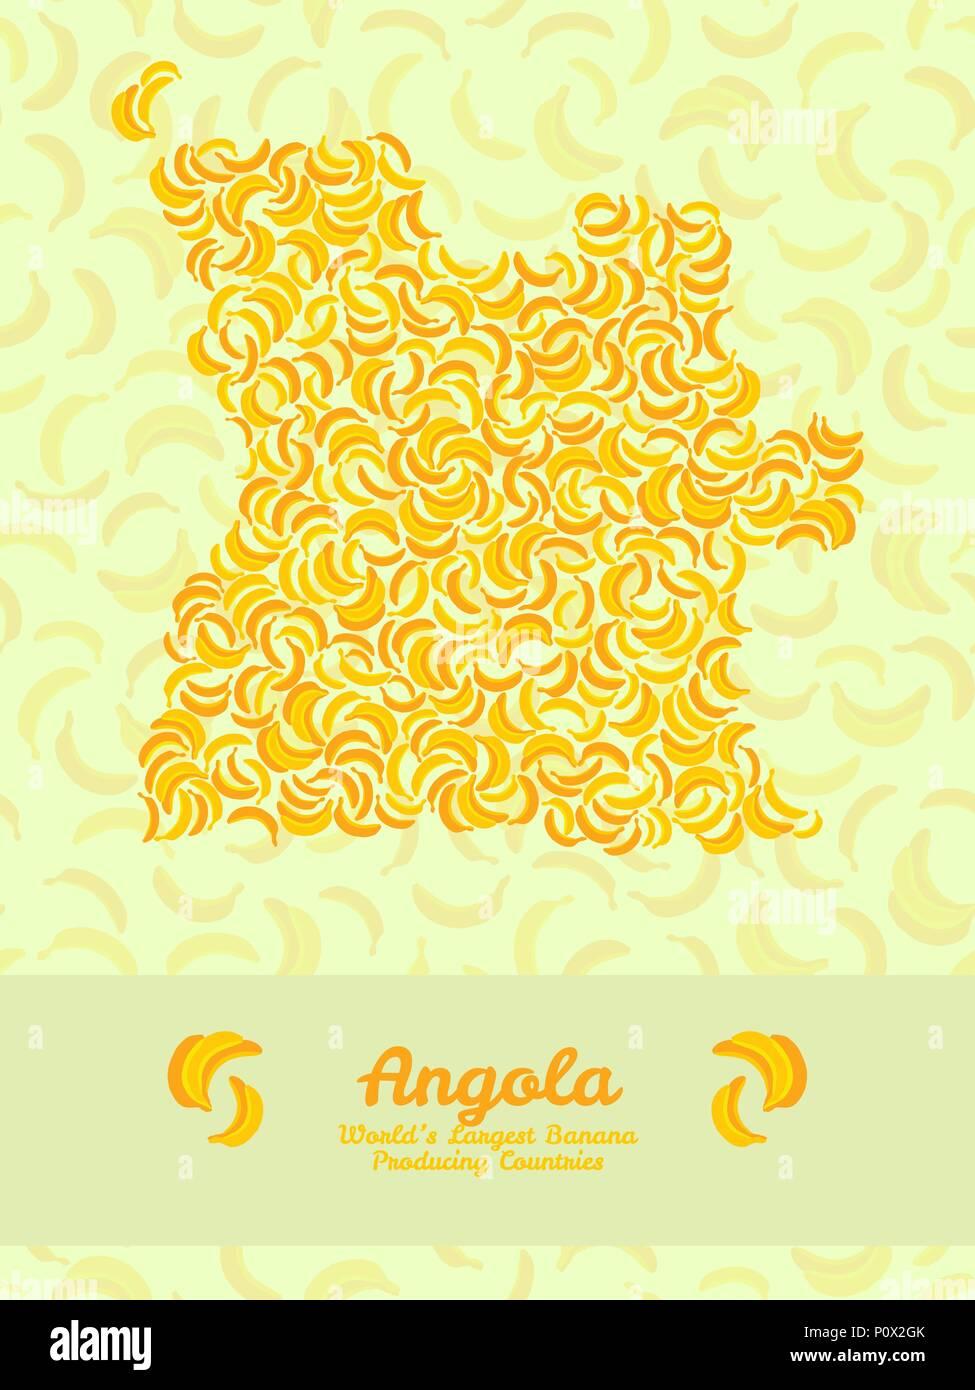 Map of Angola made out of yellow bananas. Fruitarian illustration. Angola map poster or card. Vegetarian postcard. Series: World's Largest Banana Prod - Stock Vector